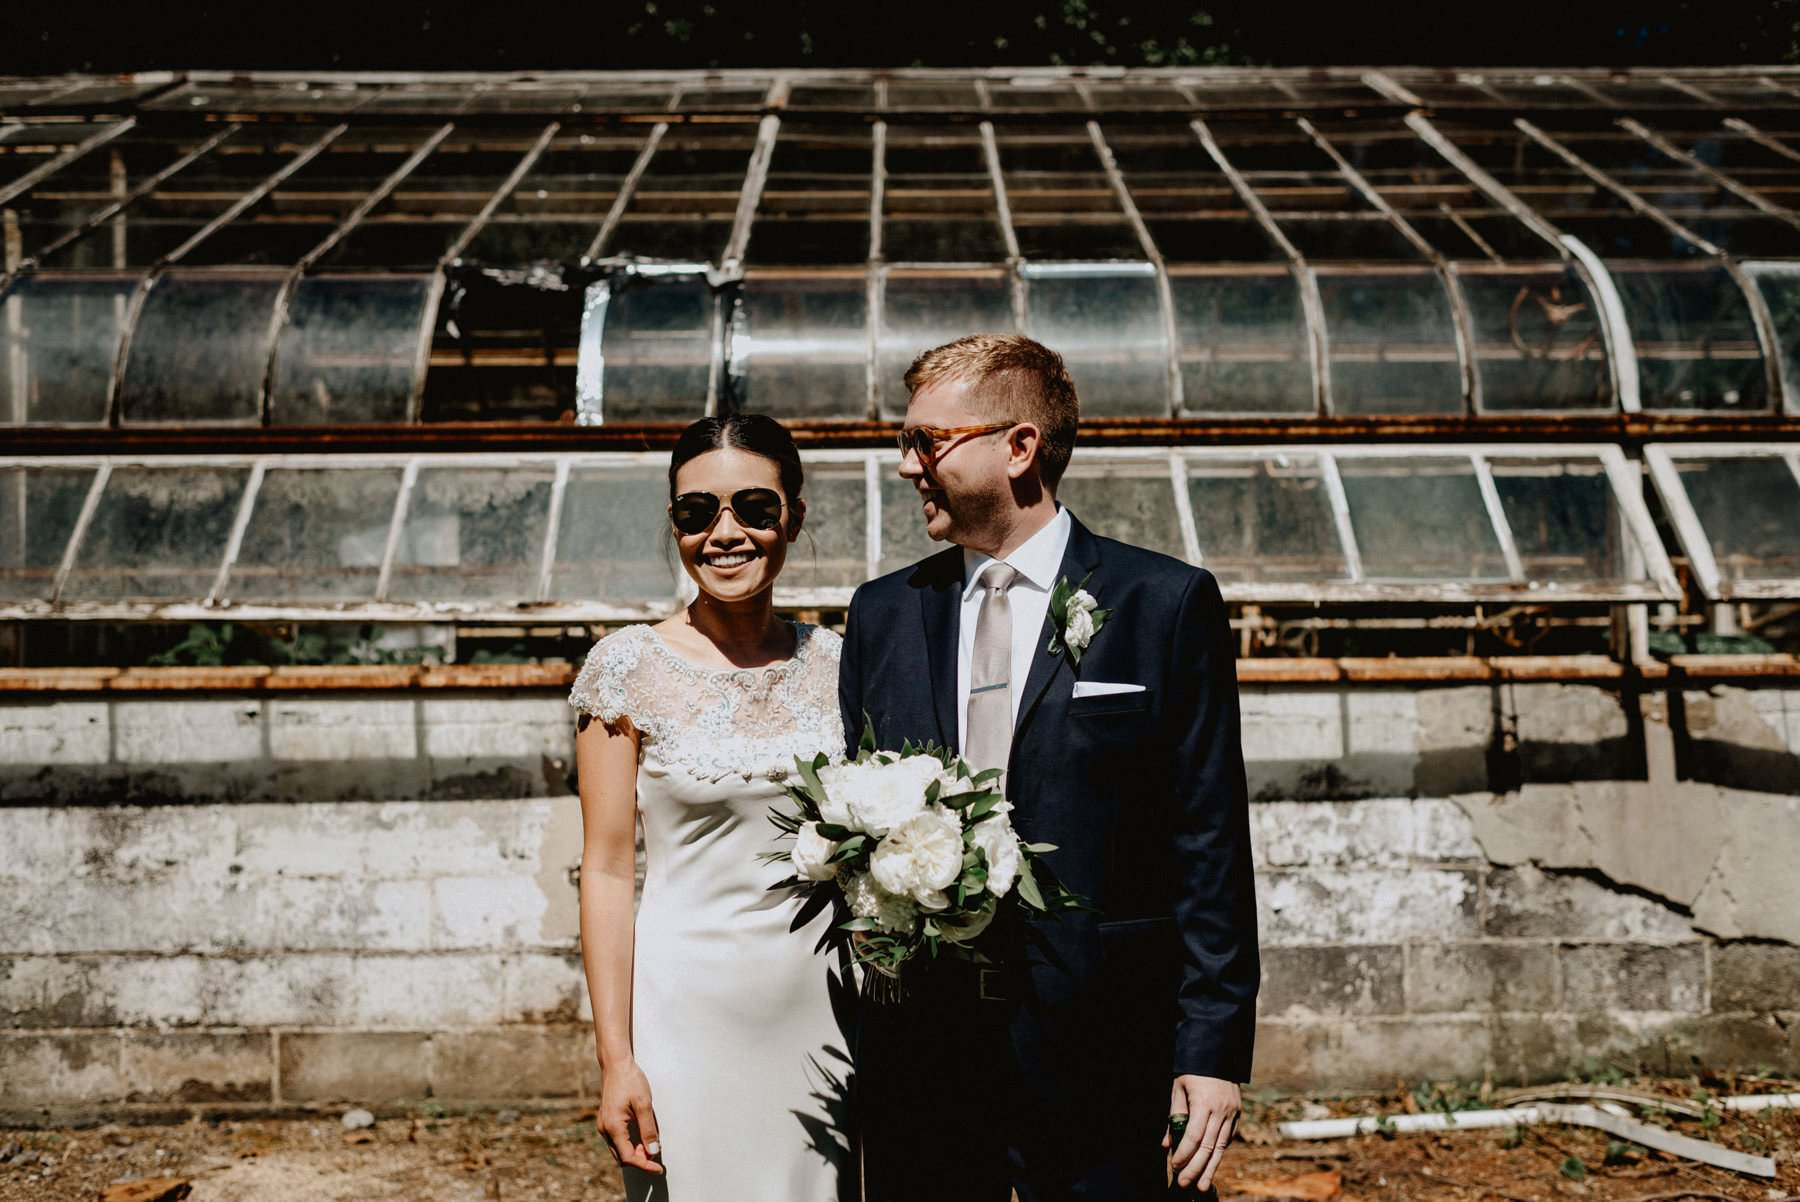 Appleford-estate-wedding-63.jpg